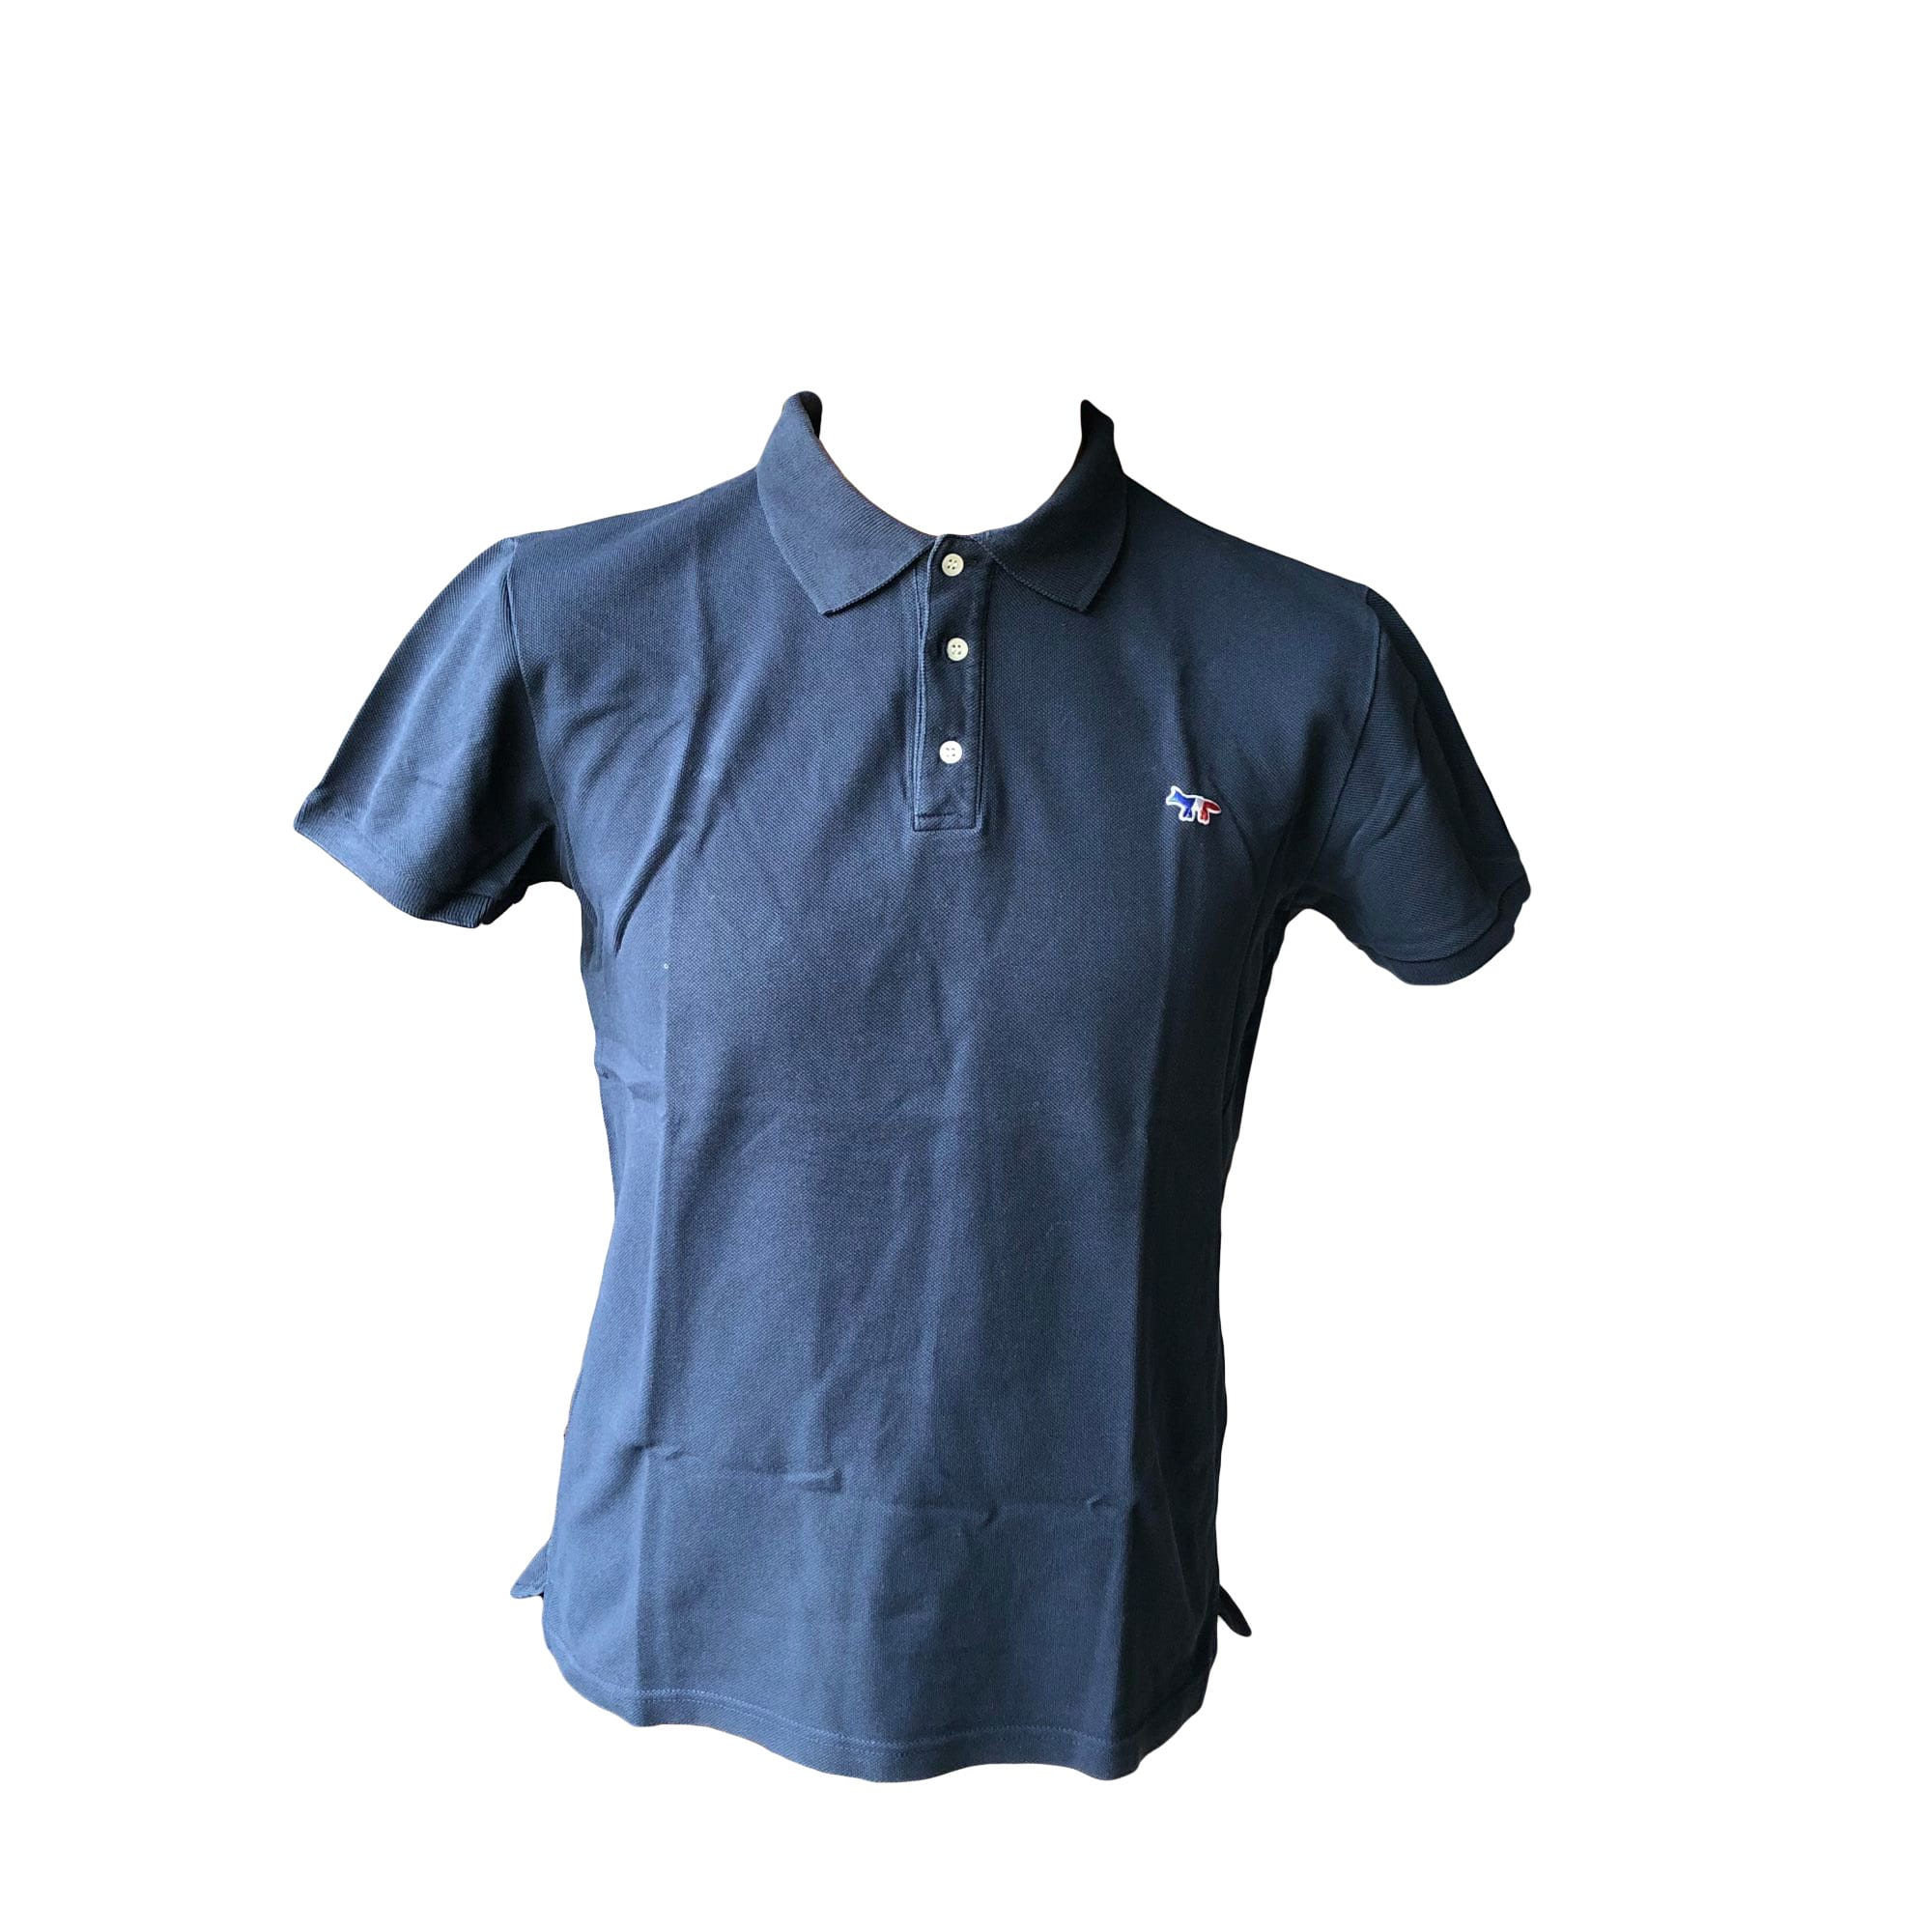 Tee-shirt MAISON KITSUNÉ Bleu, bleu marine, bleu turquoise